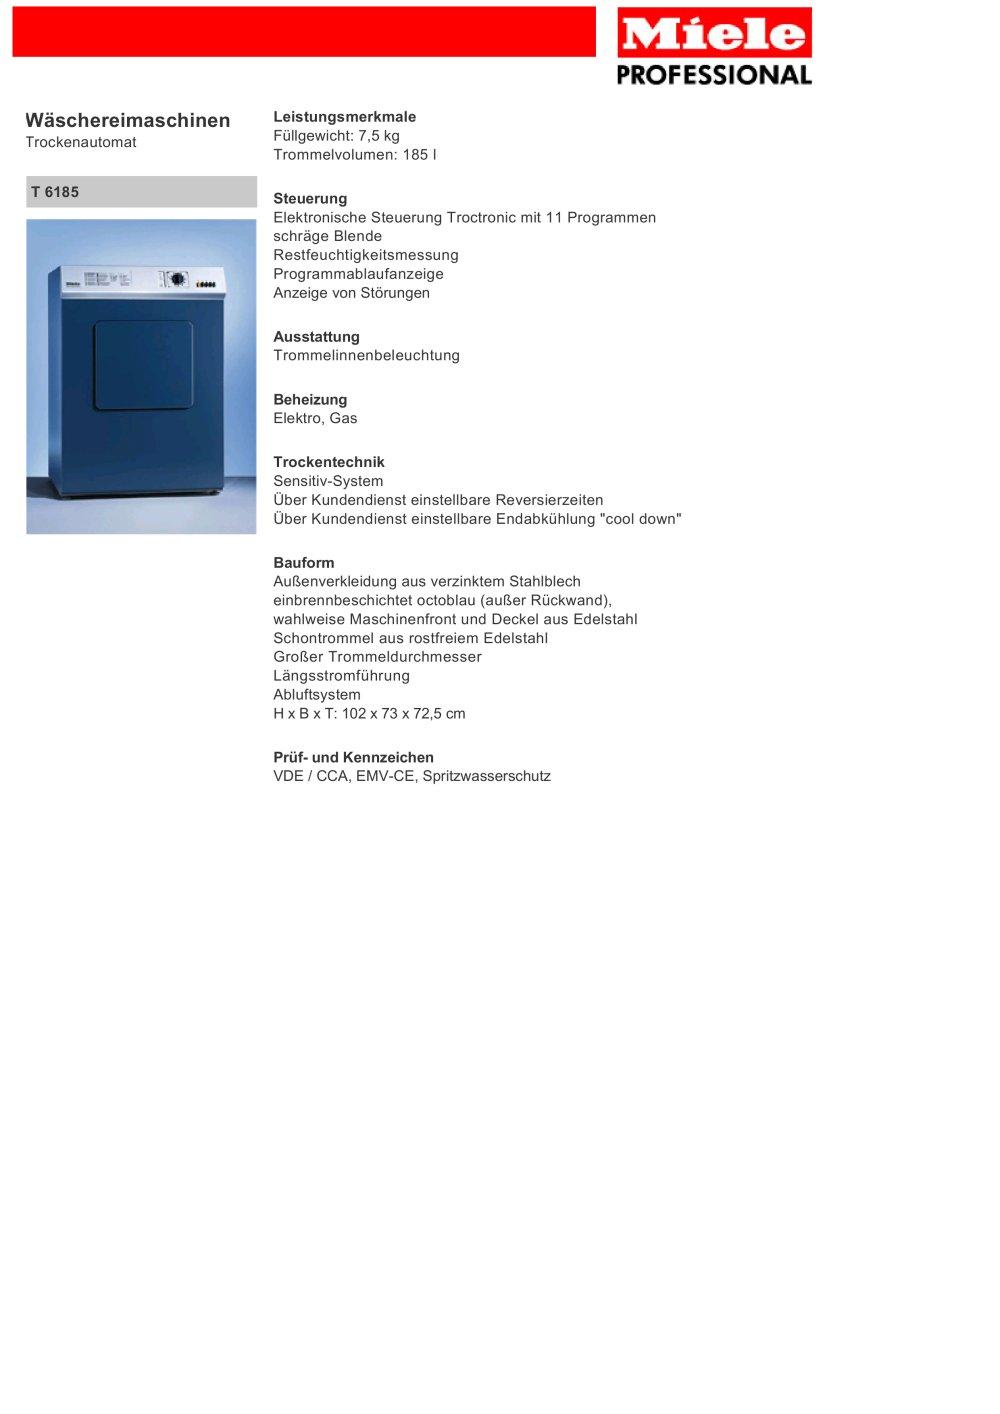 Miele T 6185 - Miele PROFESSIONAL - PDF Katalog | Beschreibung ...